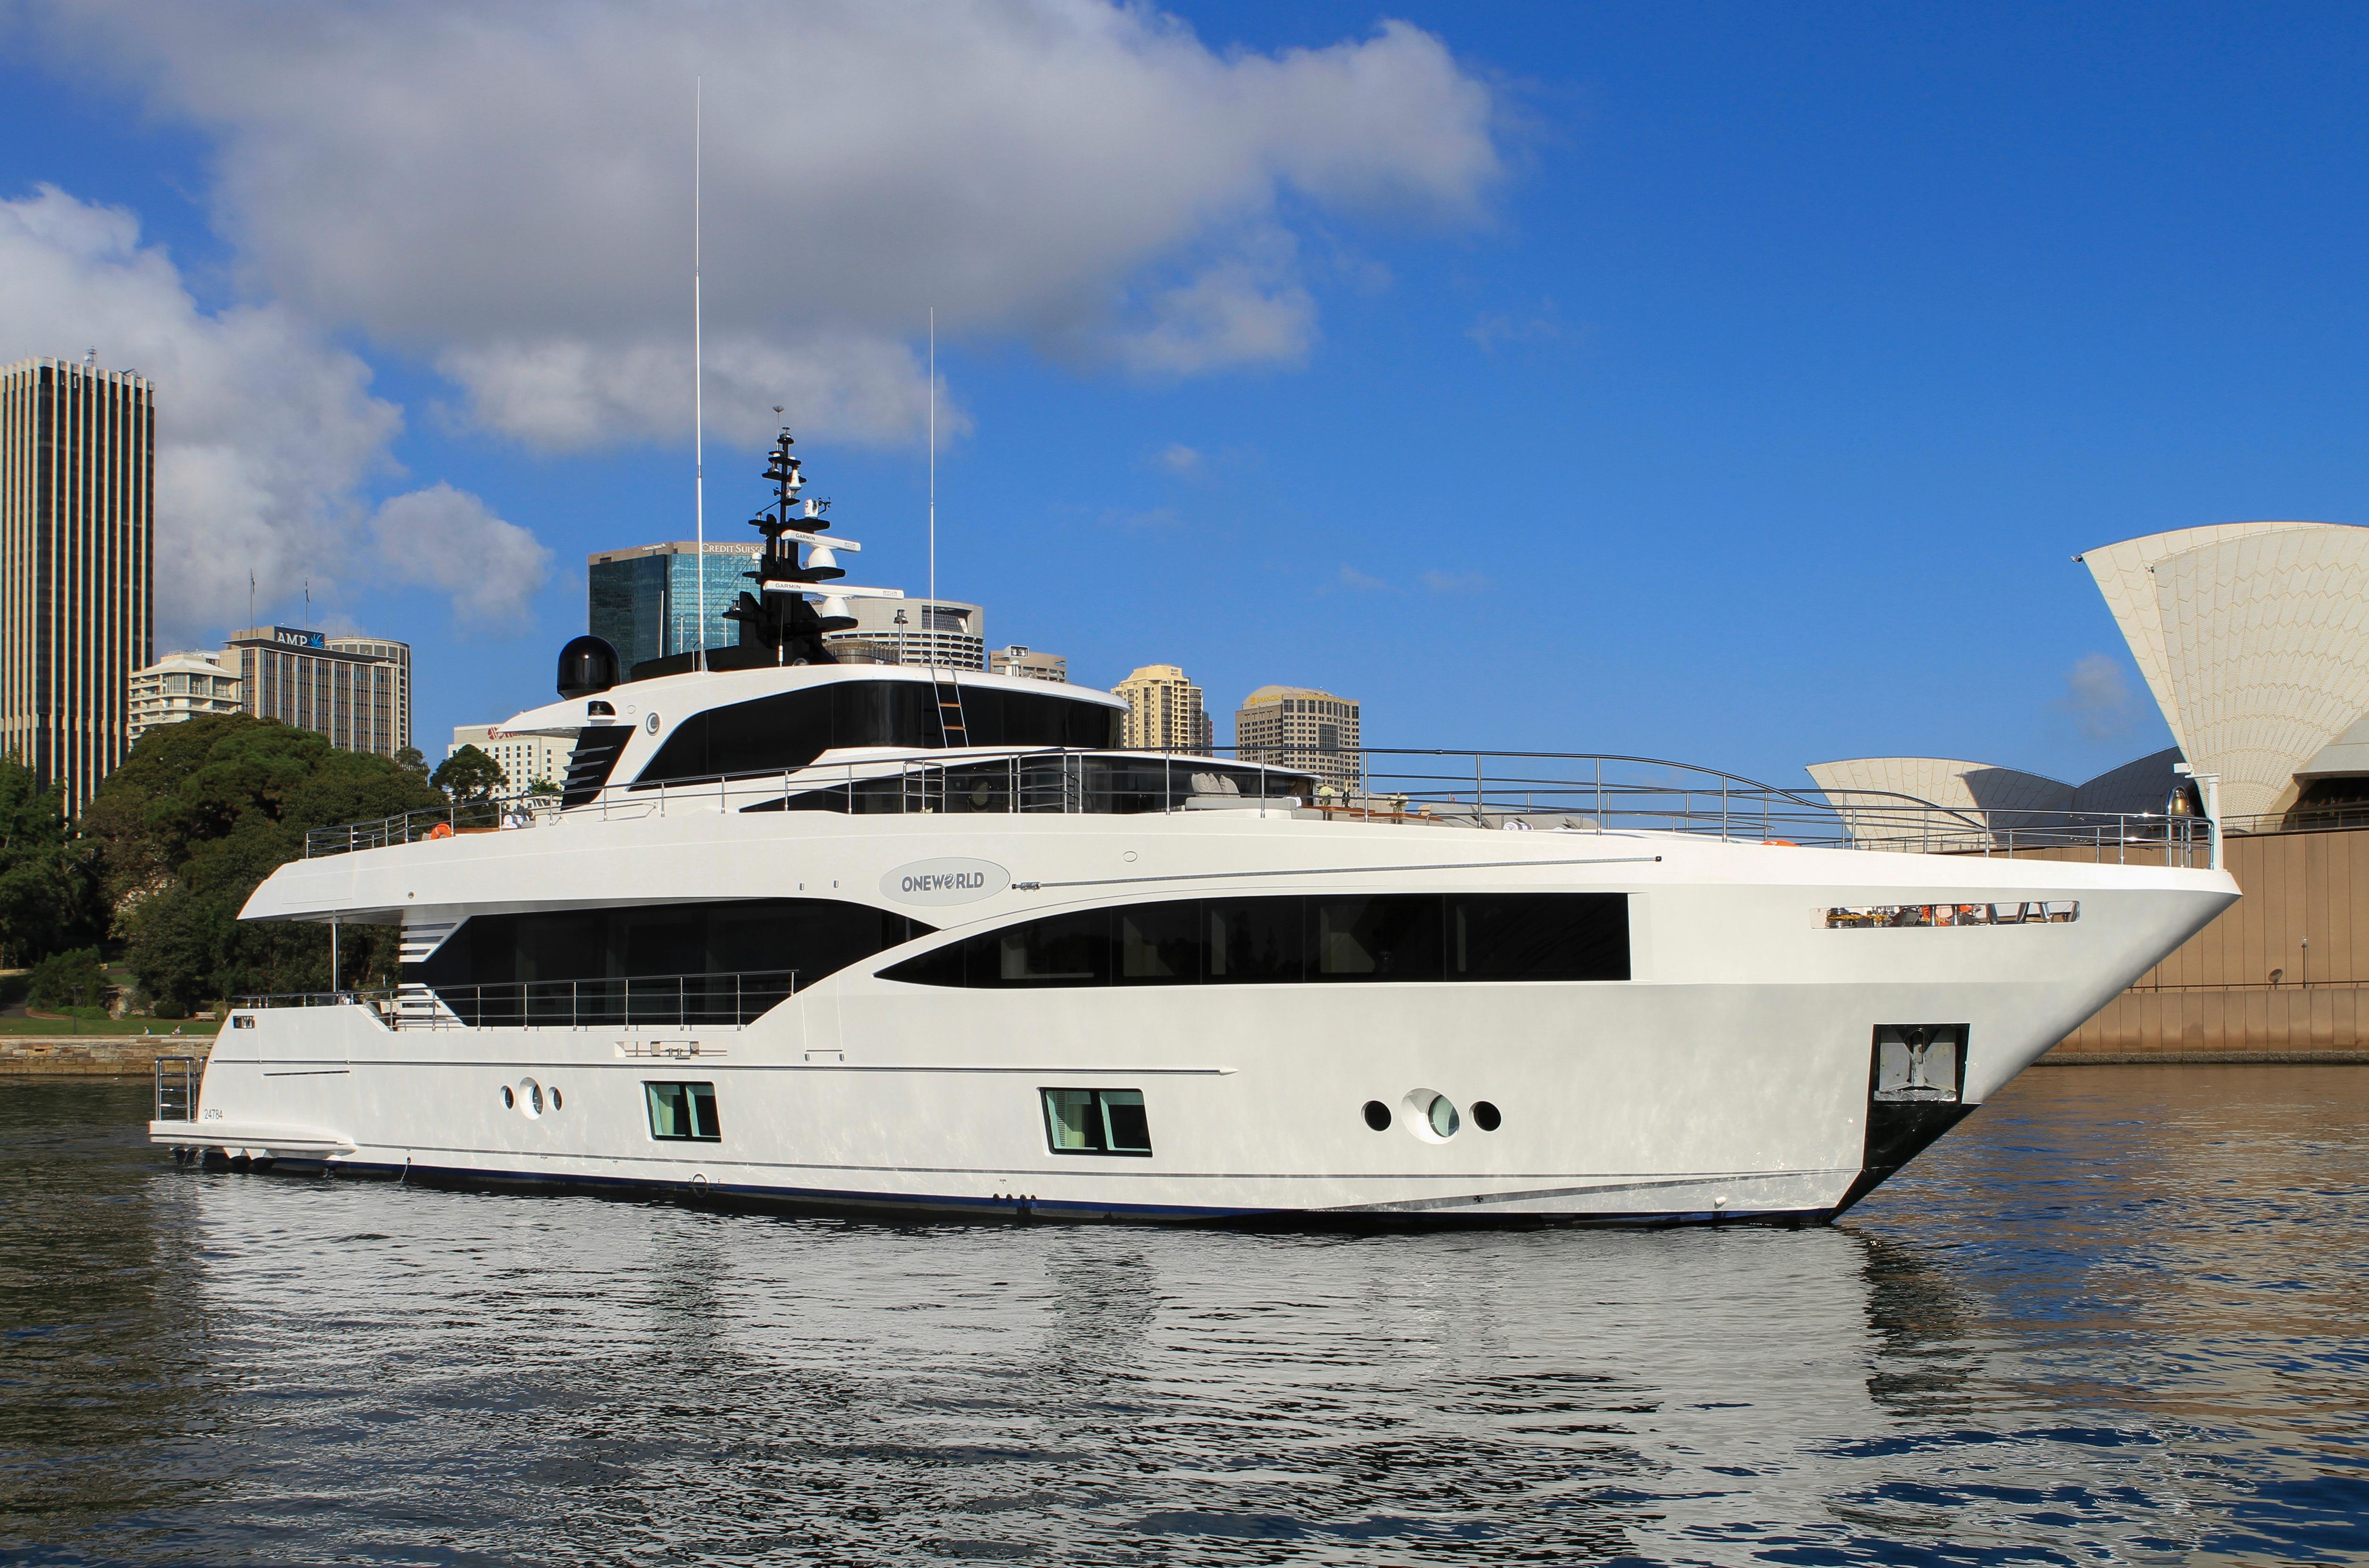 Majesty 100-3 MY Oneworld Sydney Harbour 7 April 2018 Richard Morris Australian Superyachts (145).jpg